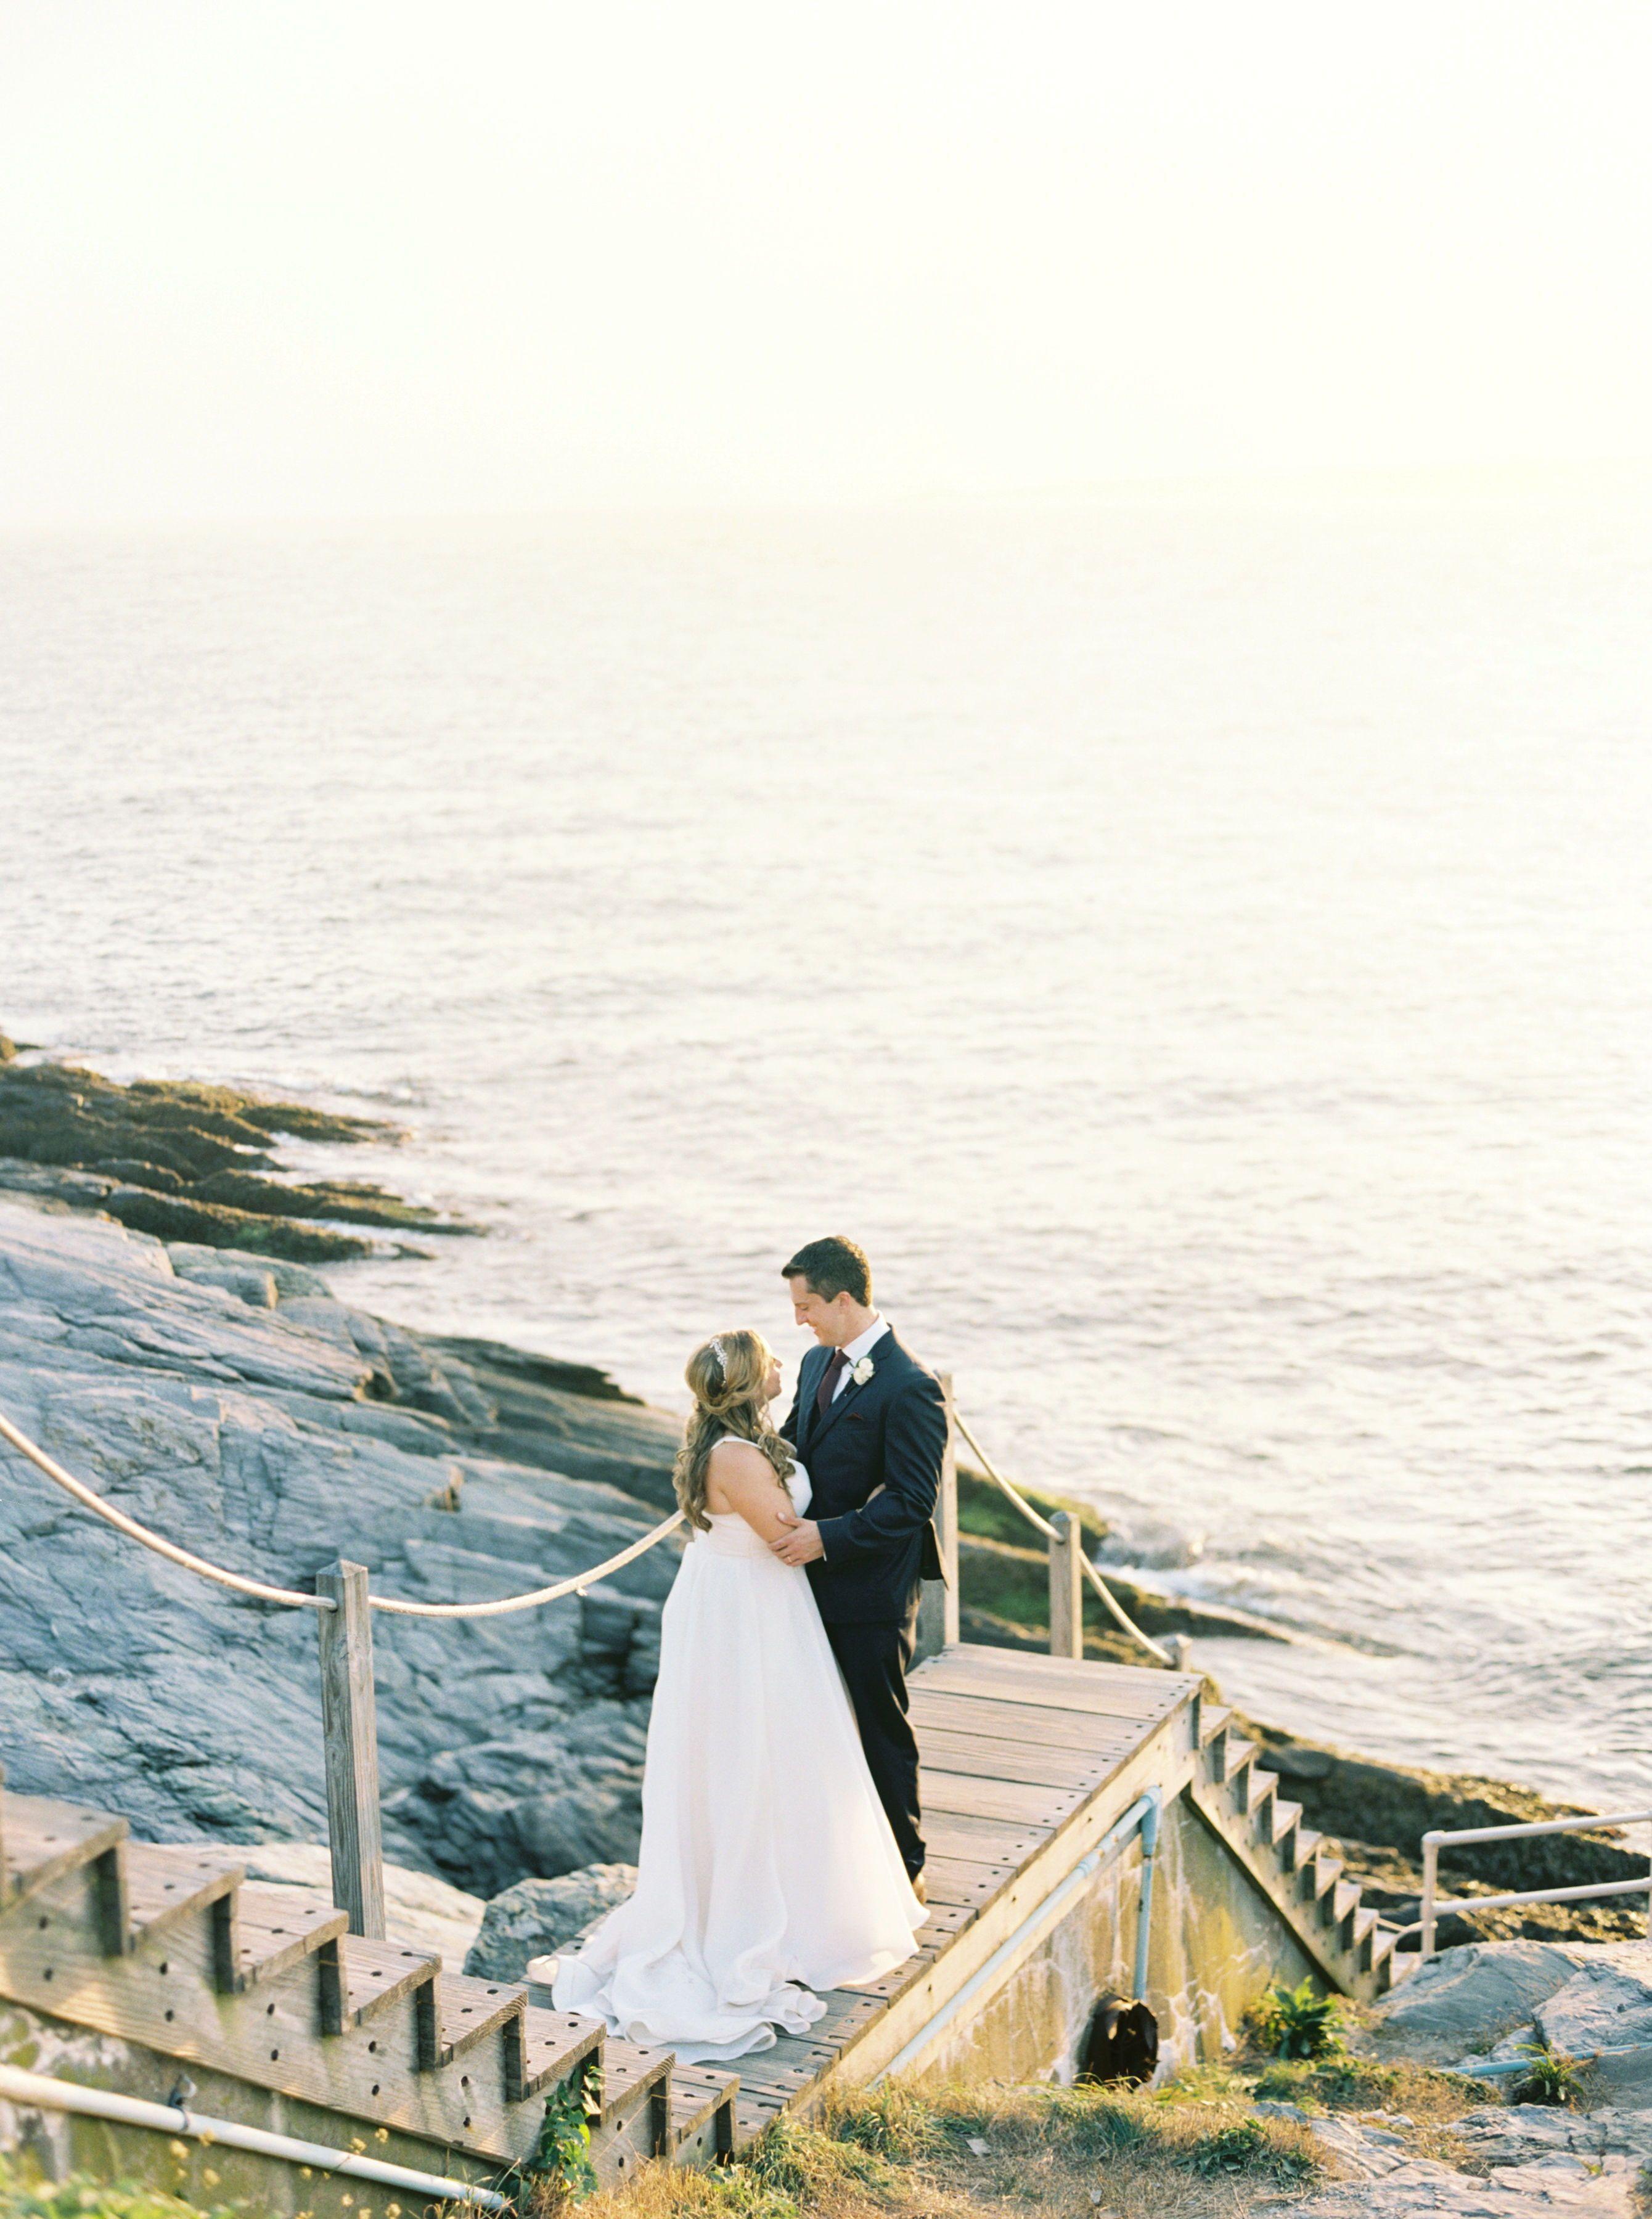 Castle Hill Lighthouse Wedding Newport Ri: Lighthouse Wedding Venue Ri At Reisefeber.org